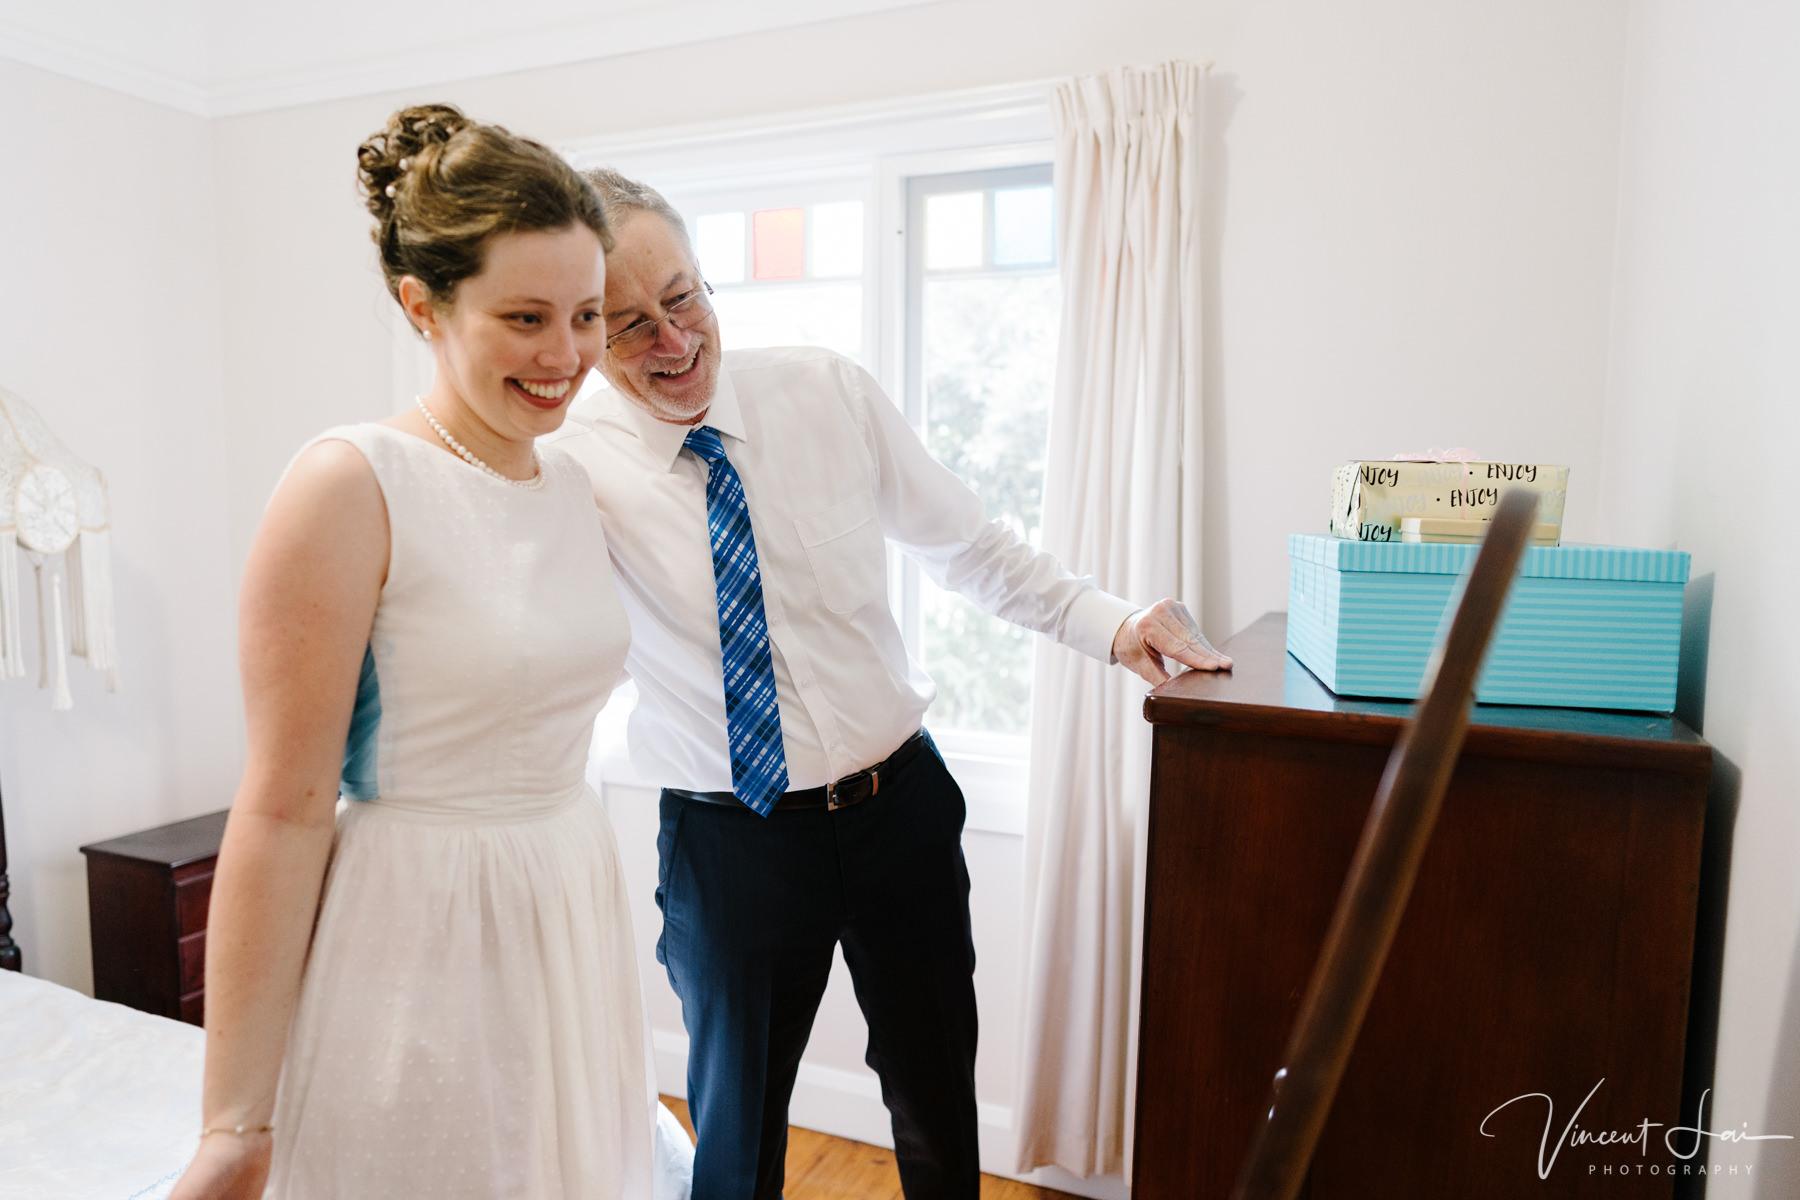 Sydney Candid Wedding Photographer